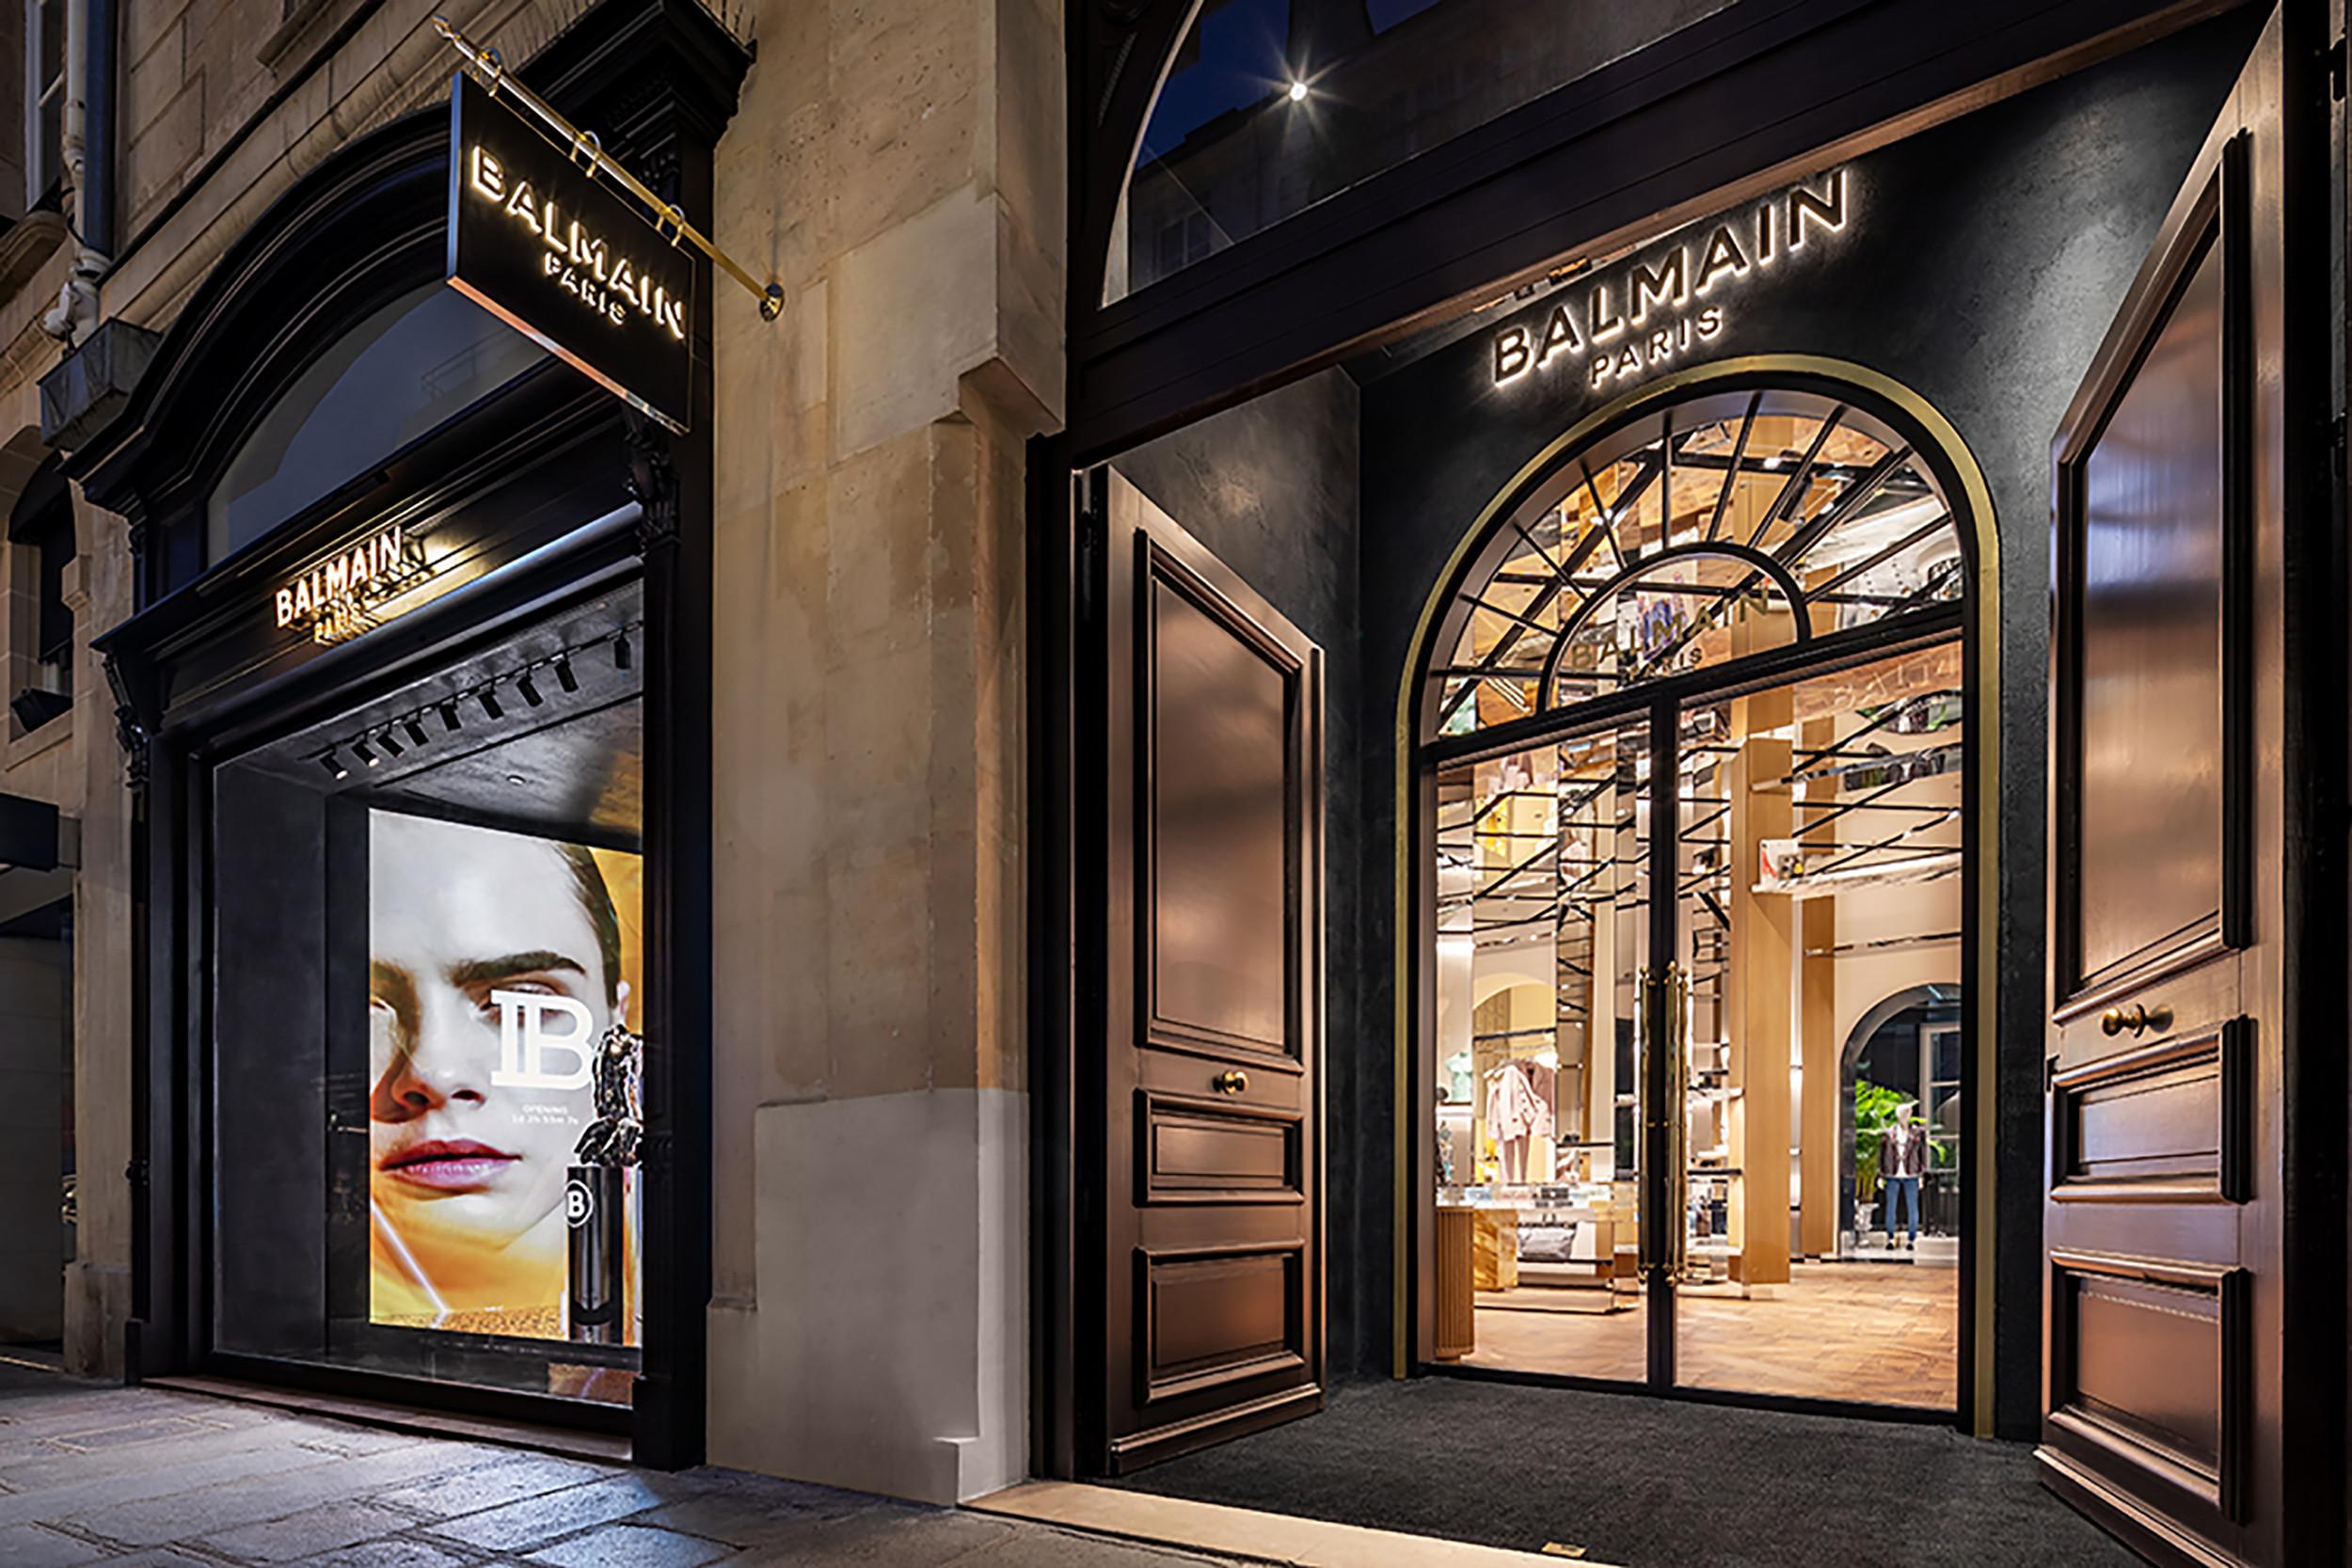 Inside Balmain's Extravagant New Boutique